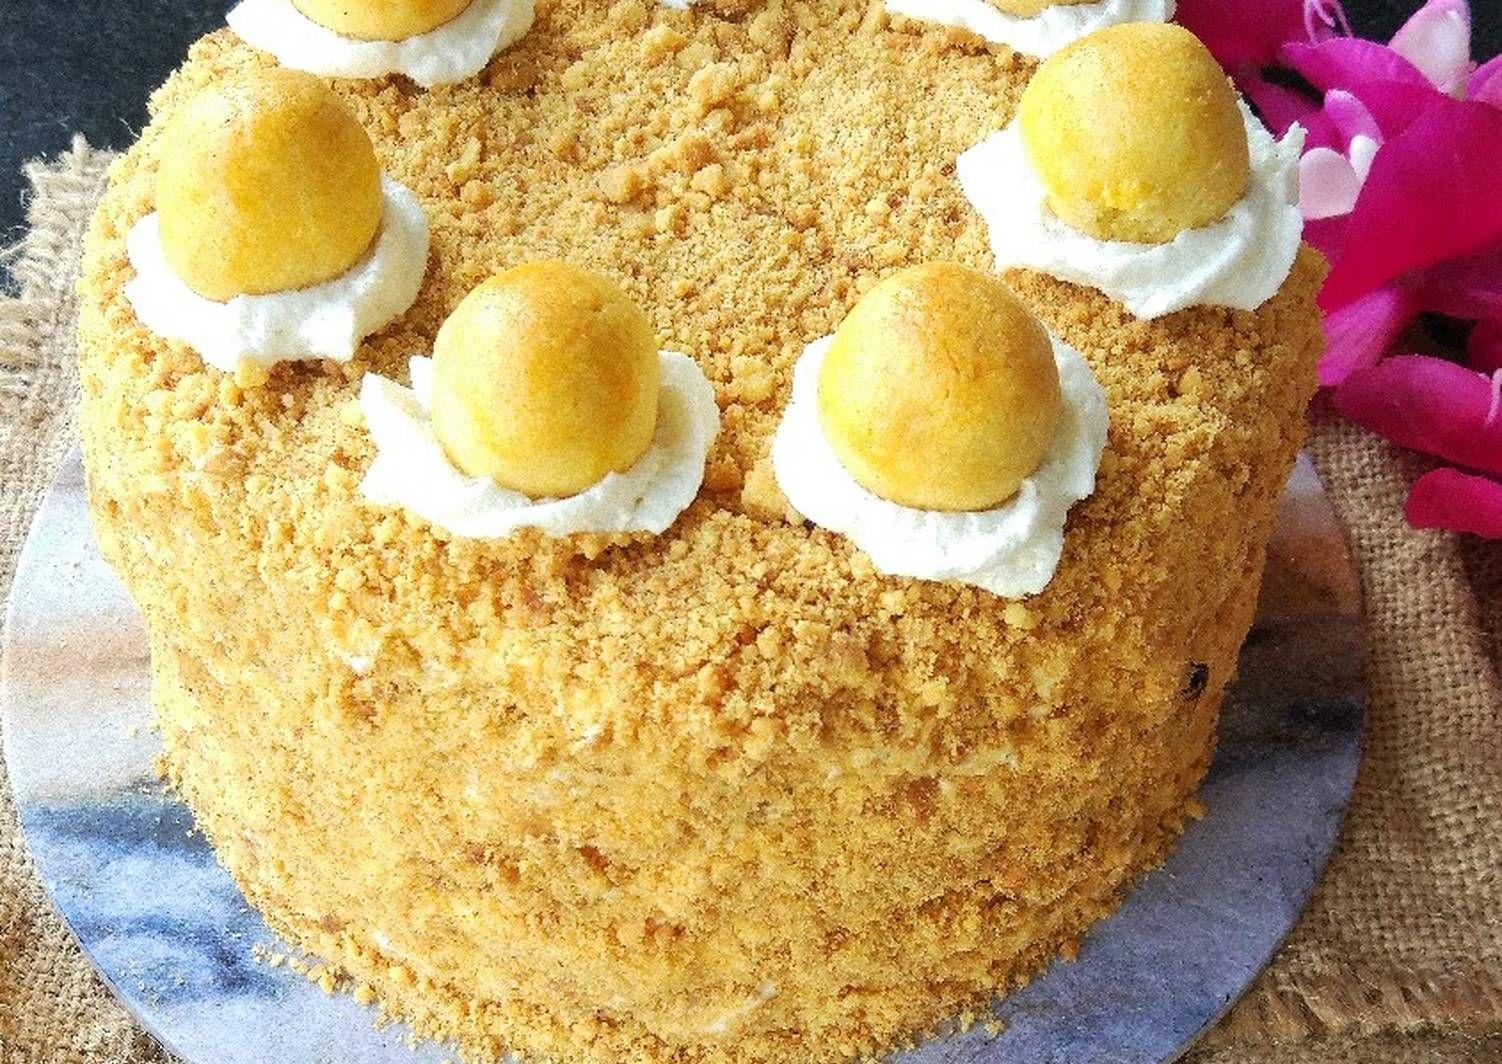 Resep Nastar Crumble Cake Oleh Indah Mulia Resep Kue Lezat Memanggang Kue Nastar